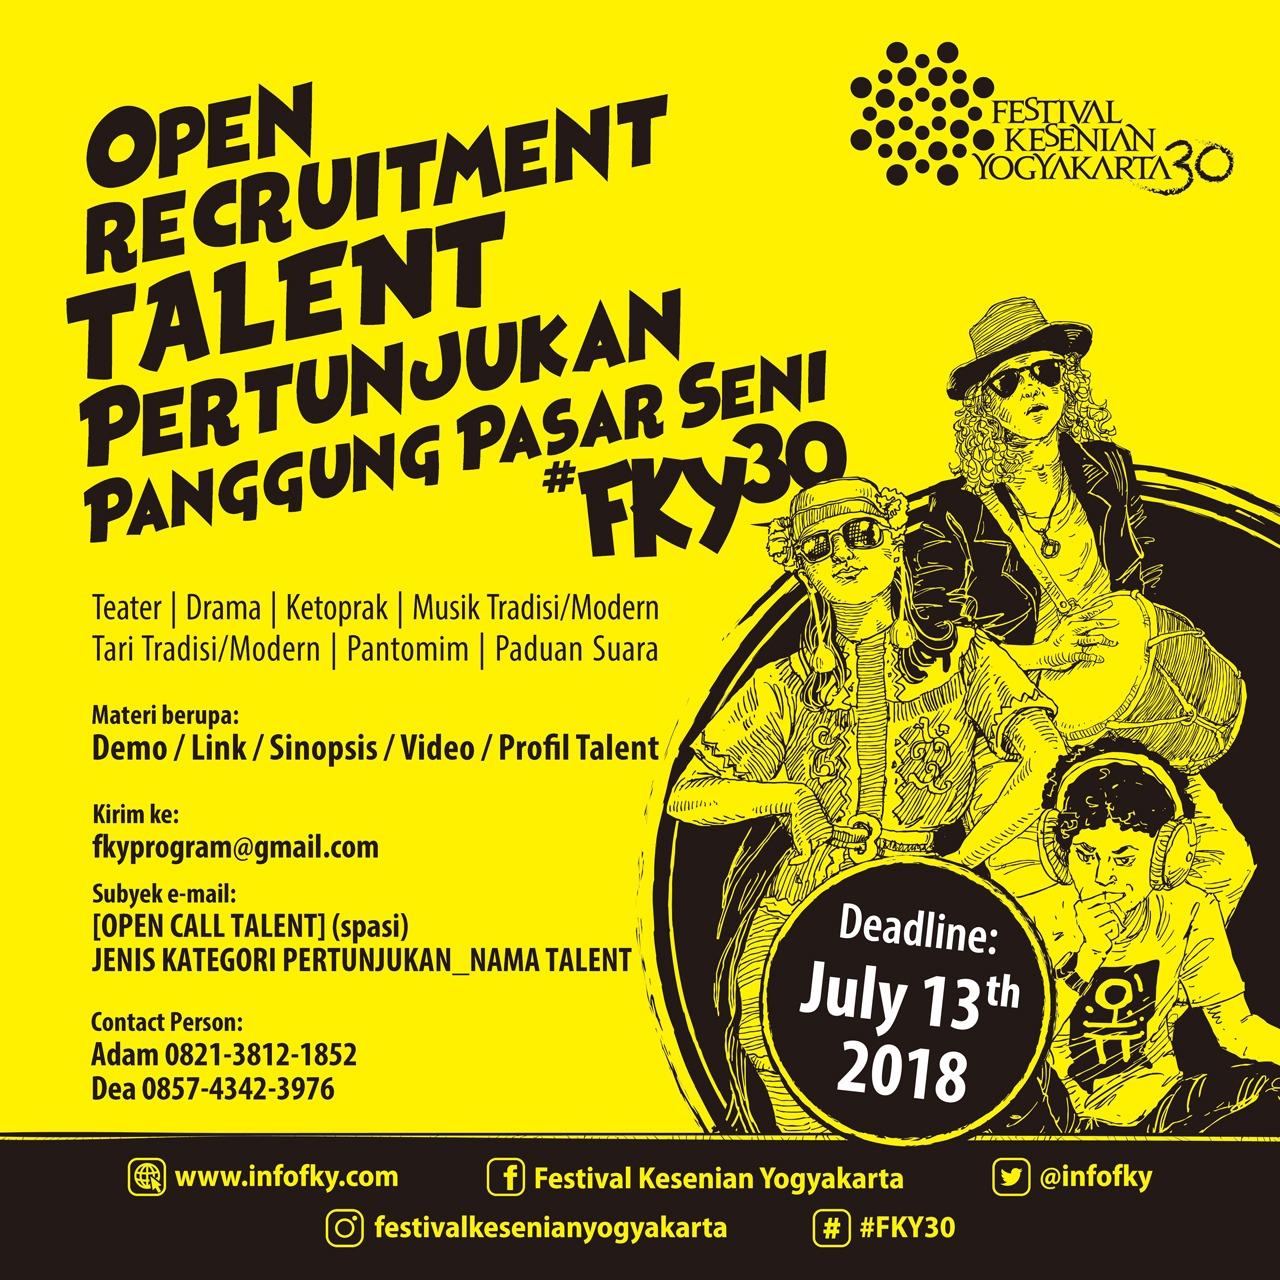 Open Recruitment Talent Festival Kesenian Yogyakarta 2018